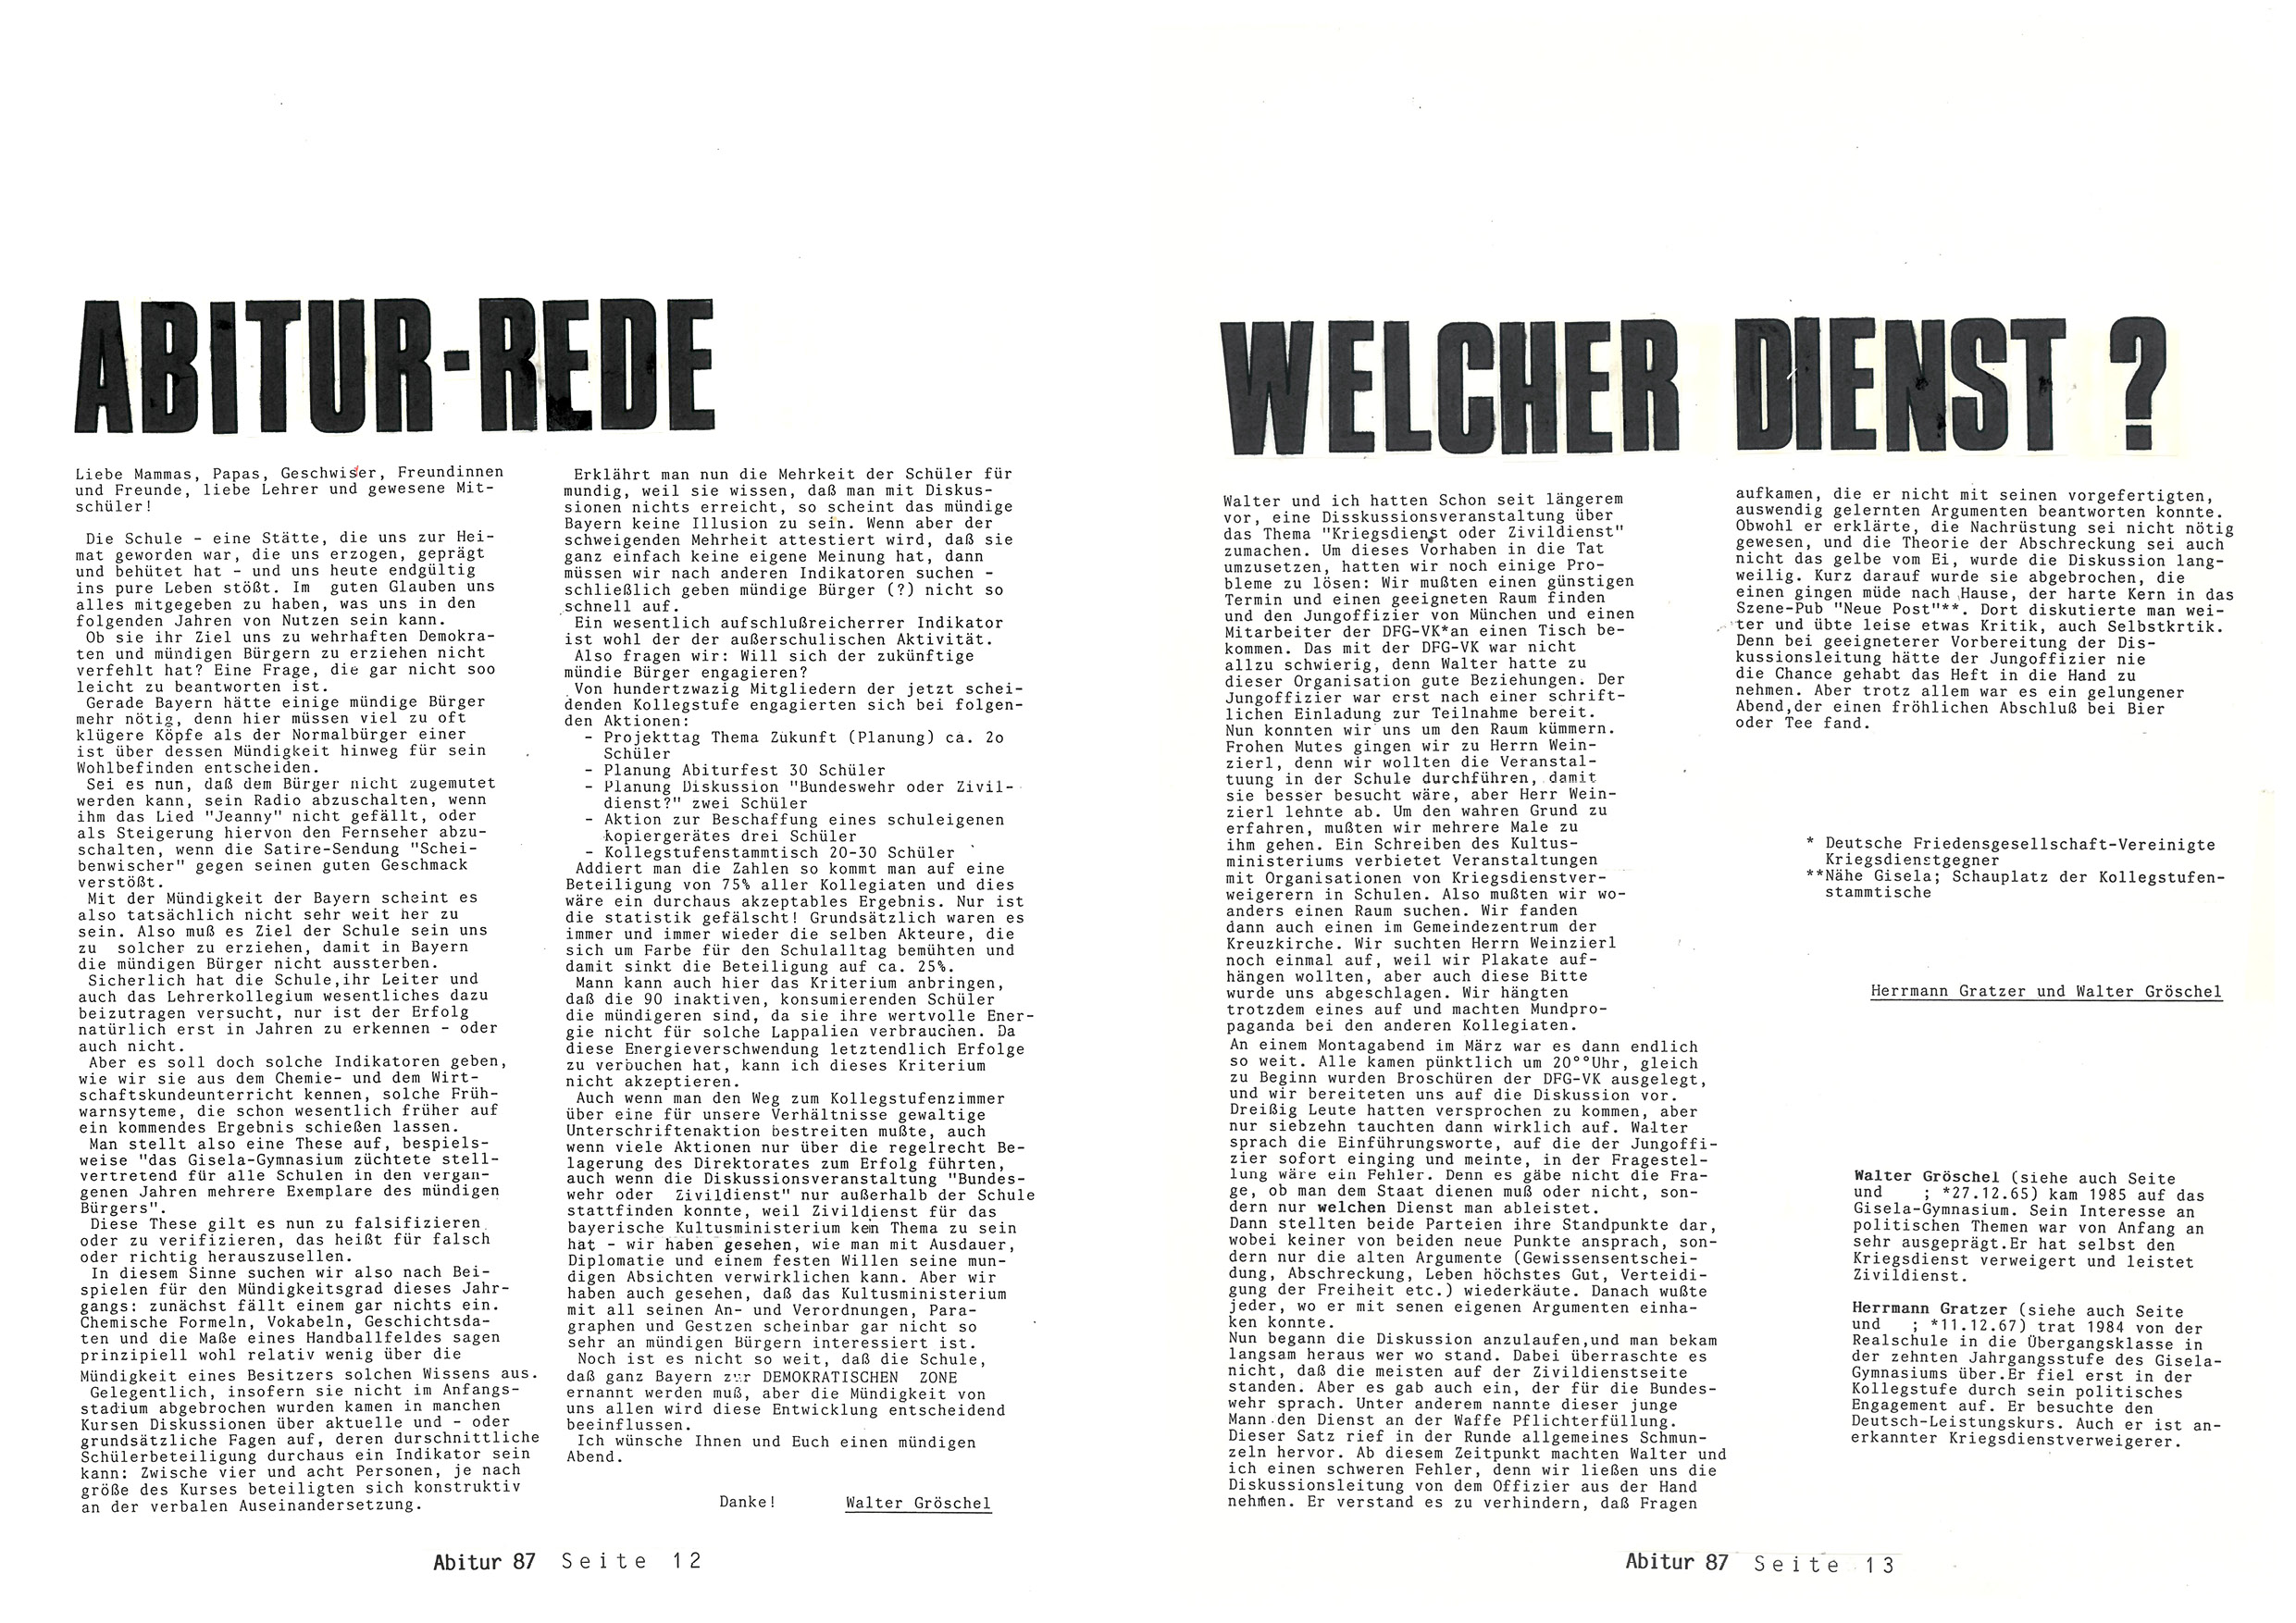 Abiturzeitung198707